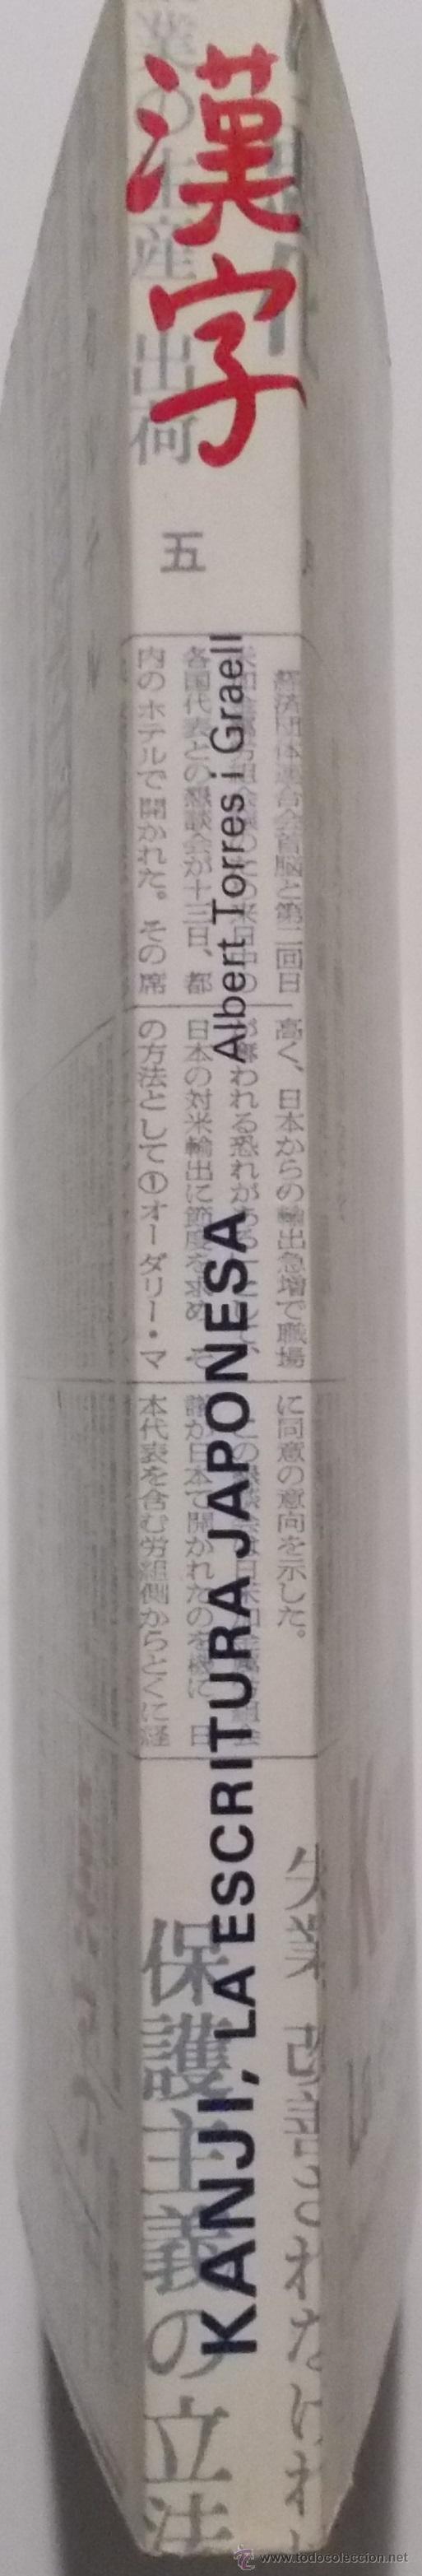 Libros: Kanji, la escritura japonesa - Foto 3 - 47557376